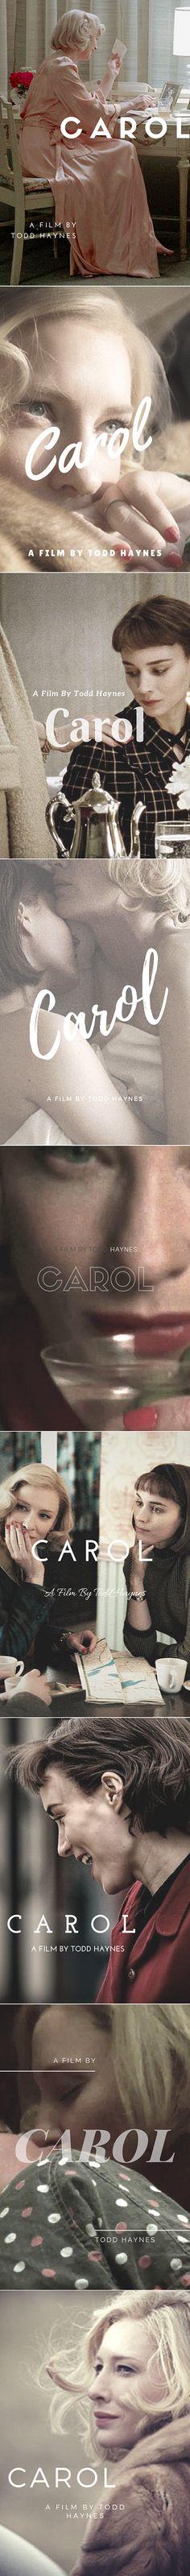 Alternative Movie Posters for Carol (2015)